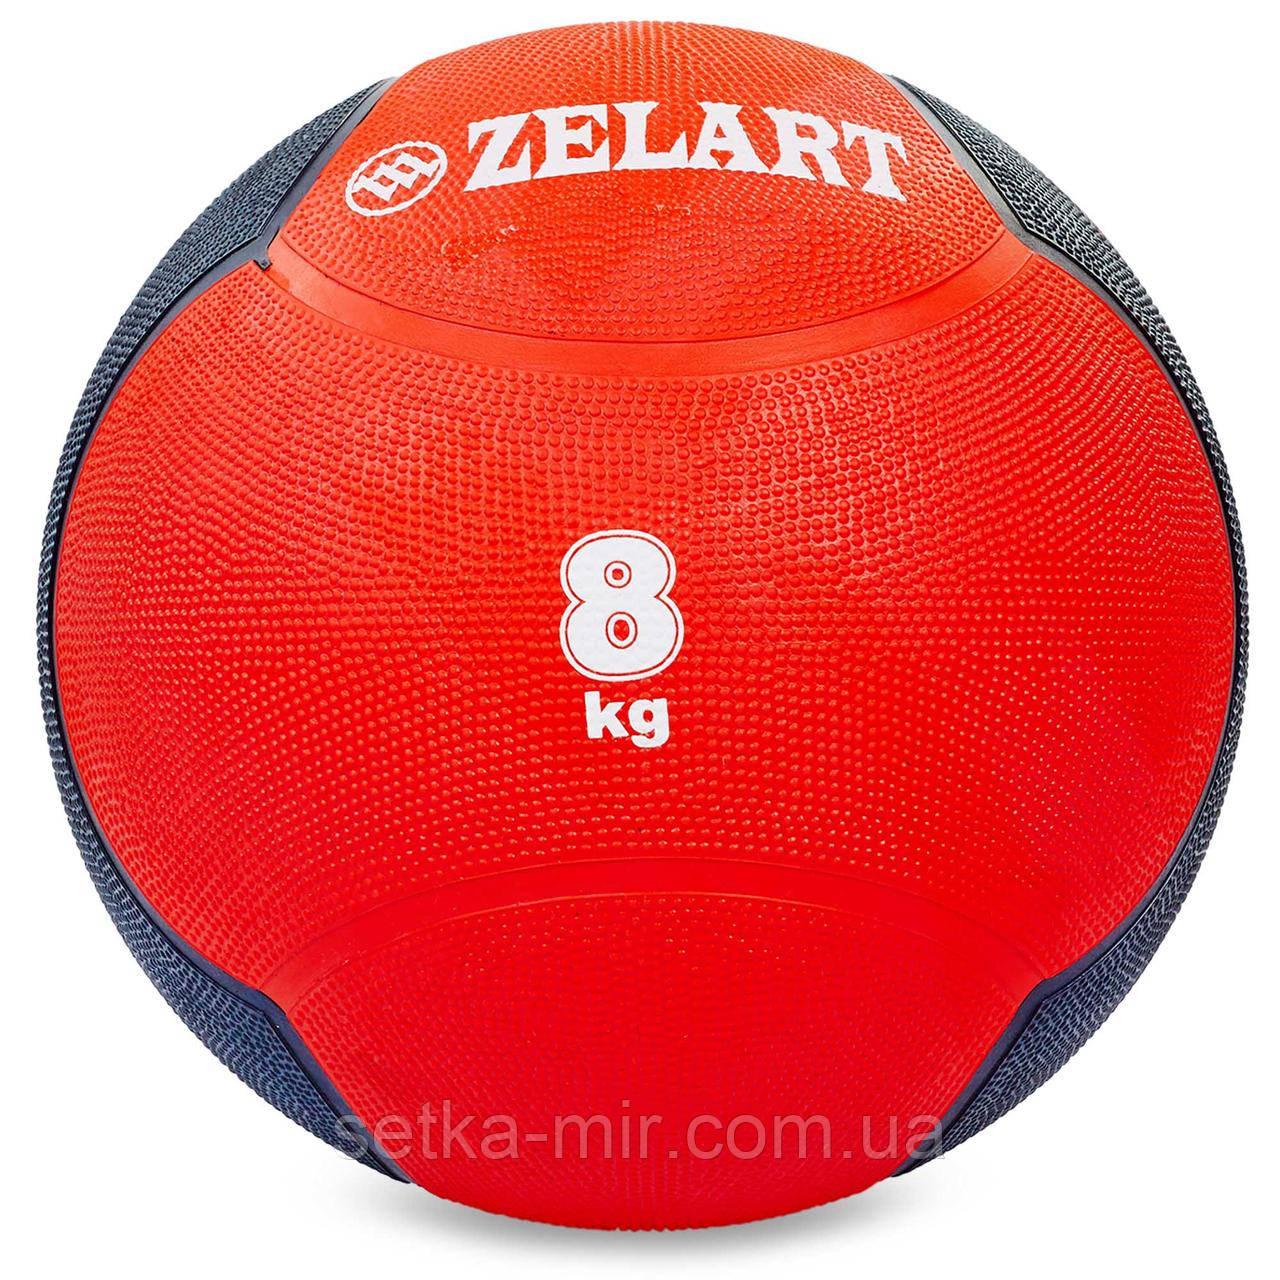 М'яч медичний медбол Zelart Medicine Ball FI-5121-8 8кг